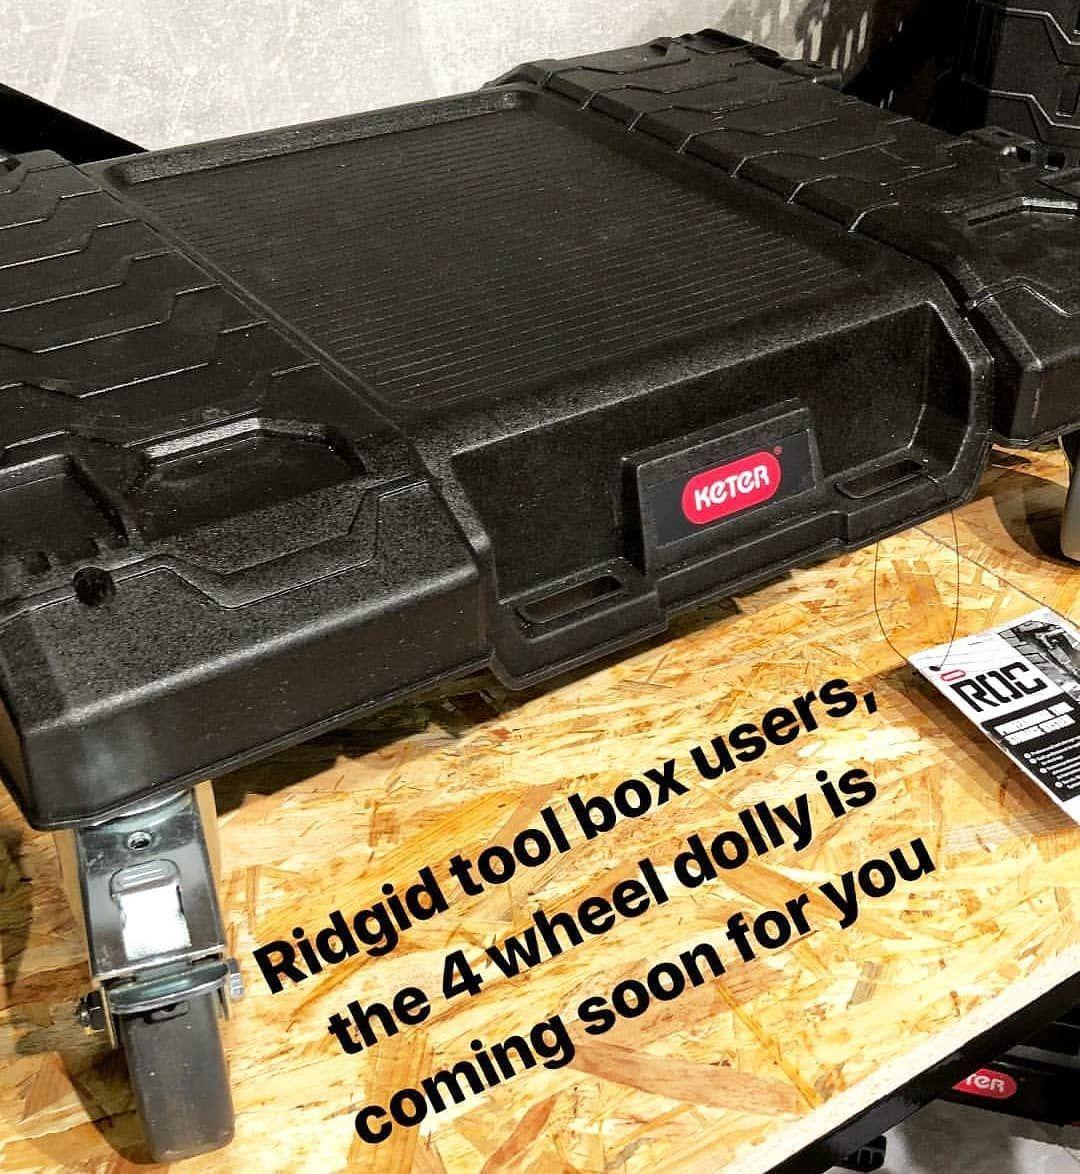 ToolsbydesignRidgid Pro Tool Box Users Rejoice! A 4